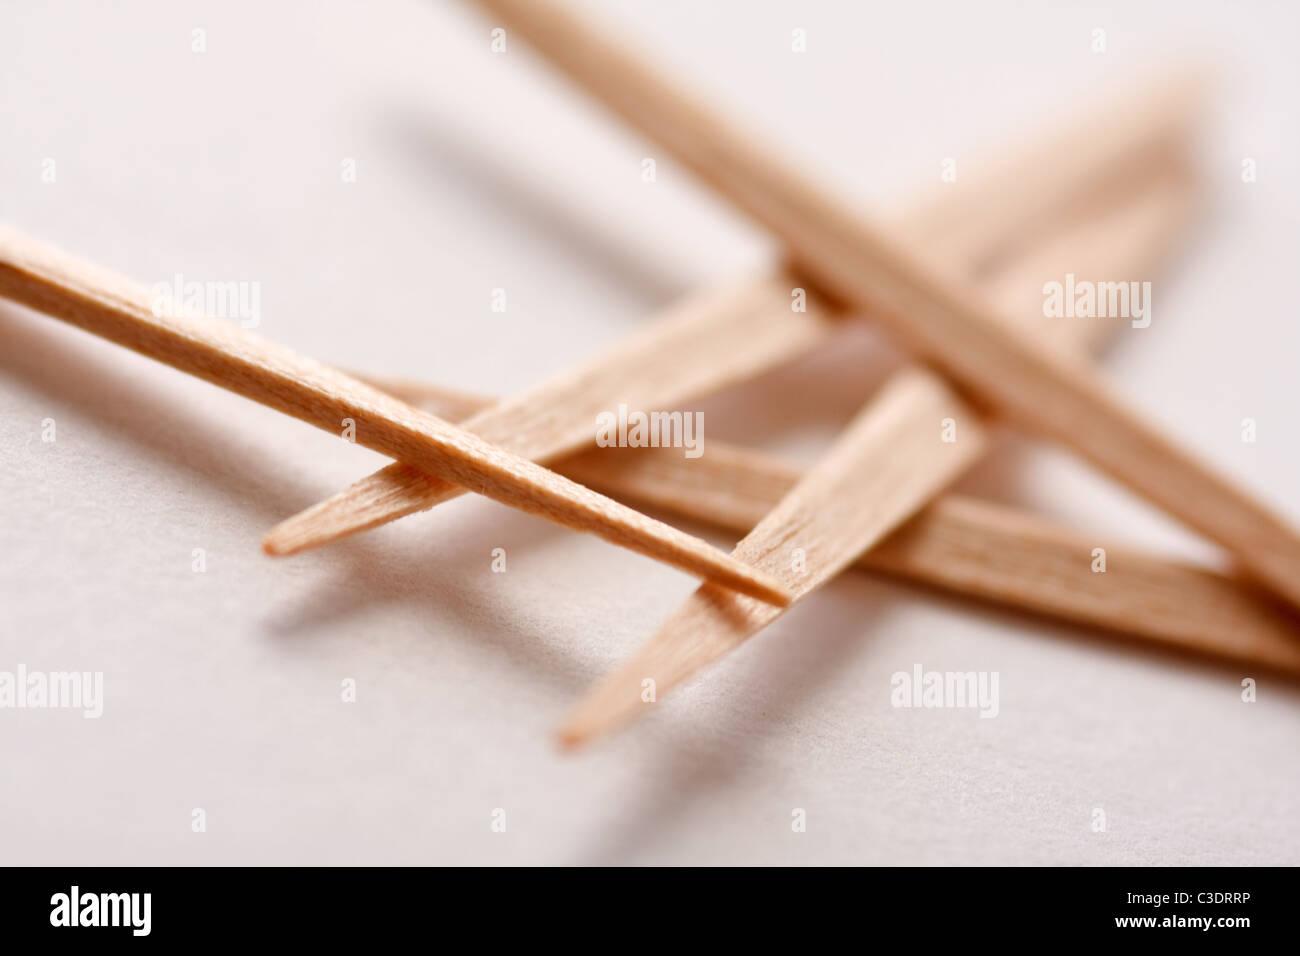 Wisdom Dental Sticks - Stock Image